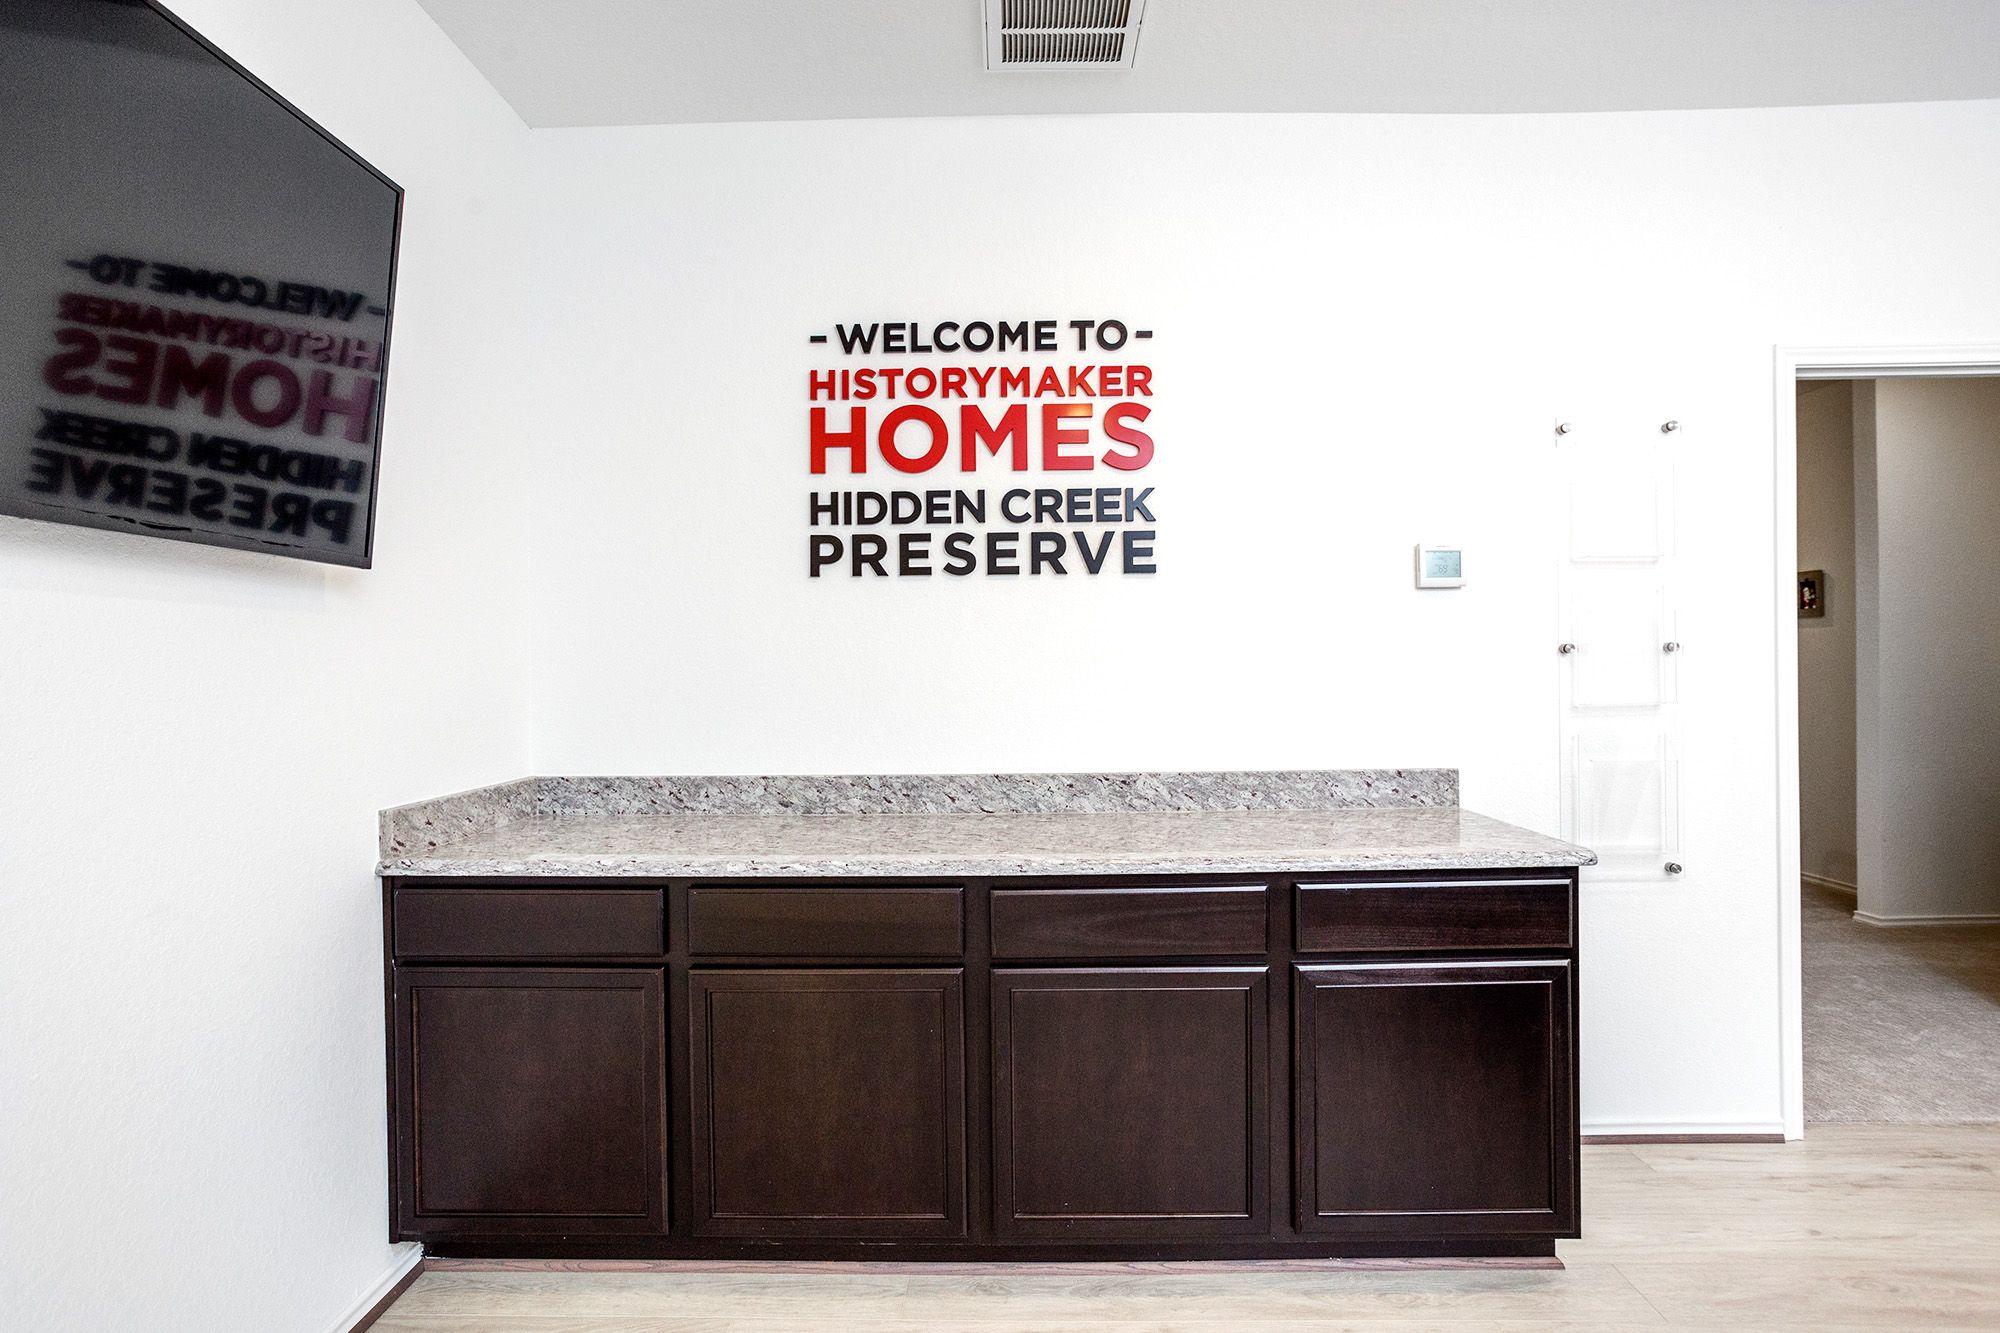 'Hidden Creek Preserve' by HistoryMaker Homes in Houston